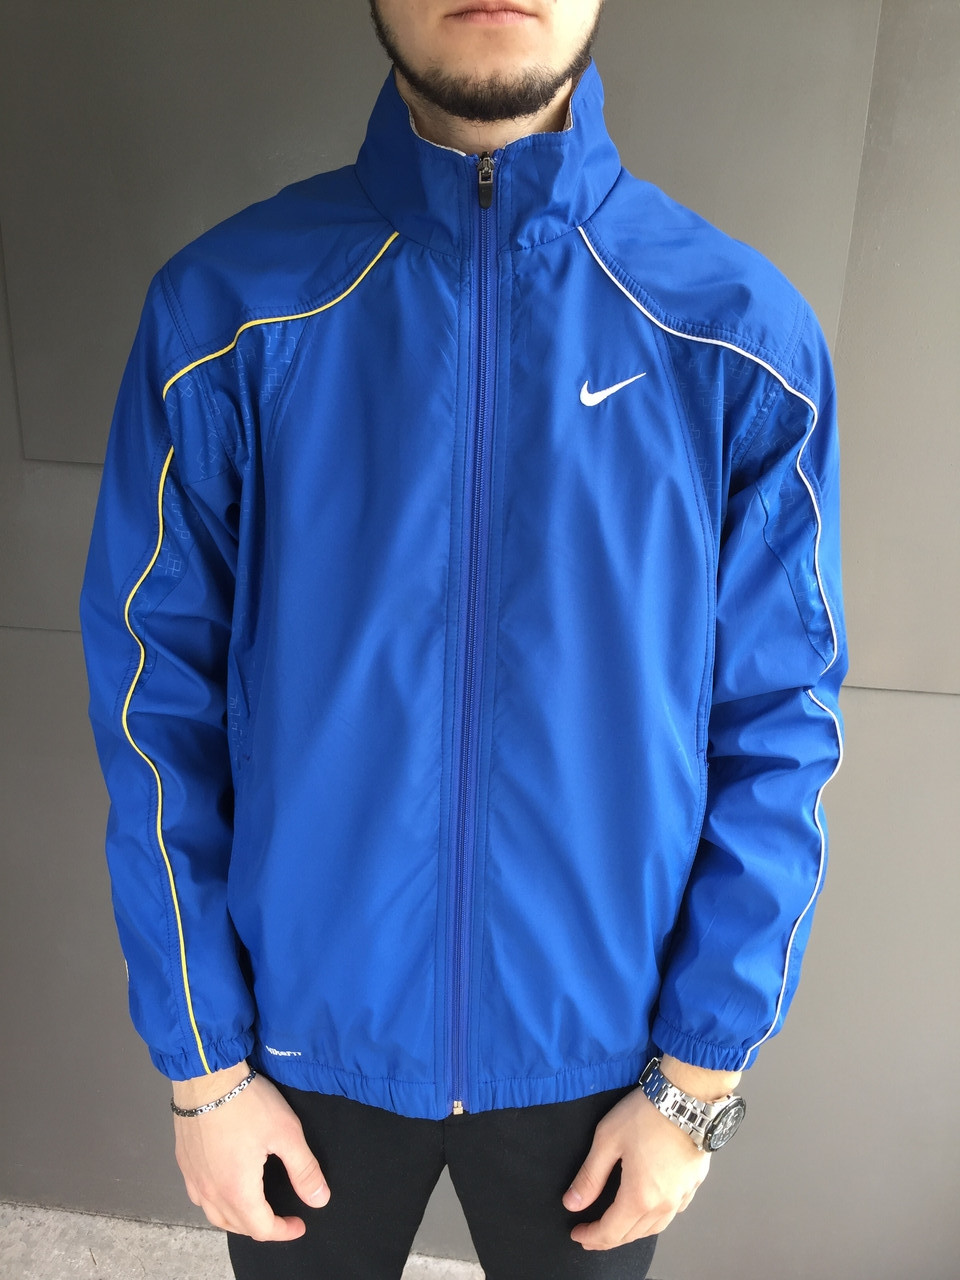 Ветровка мужской Nike.Плащевка